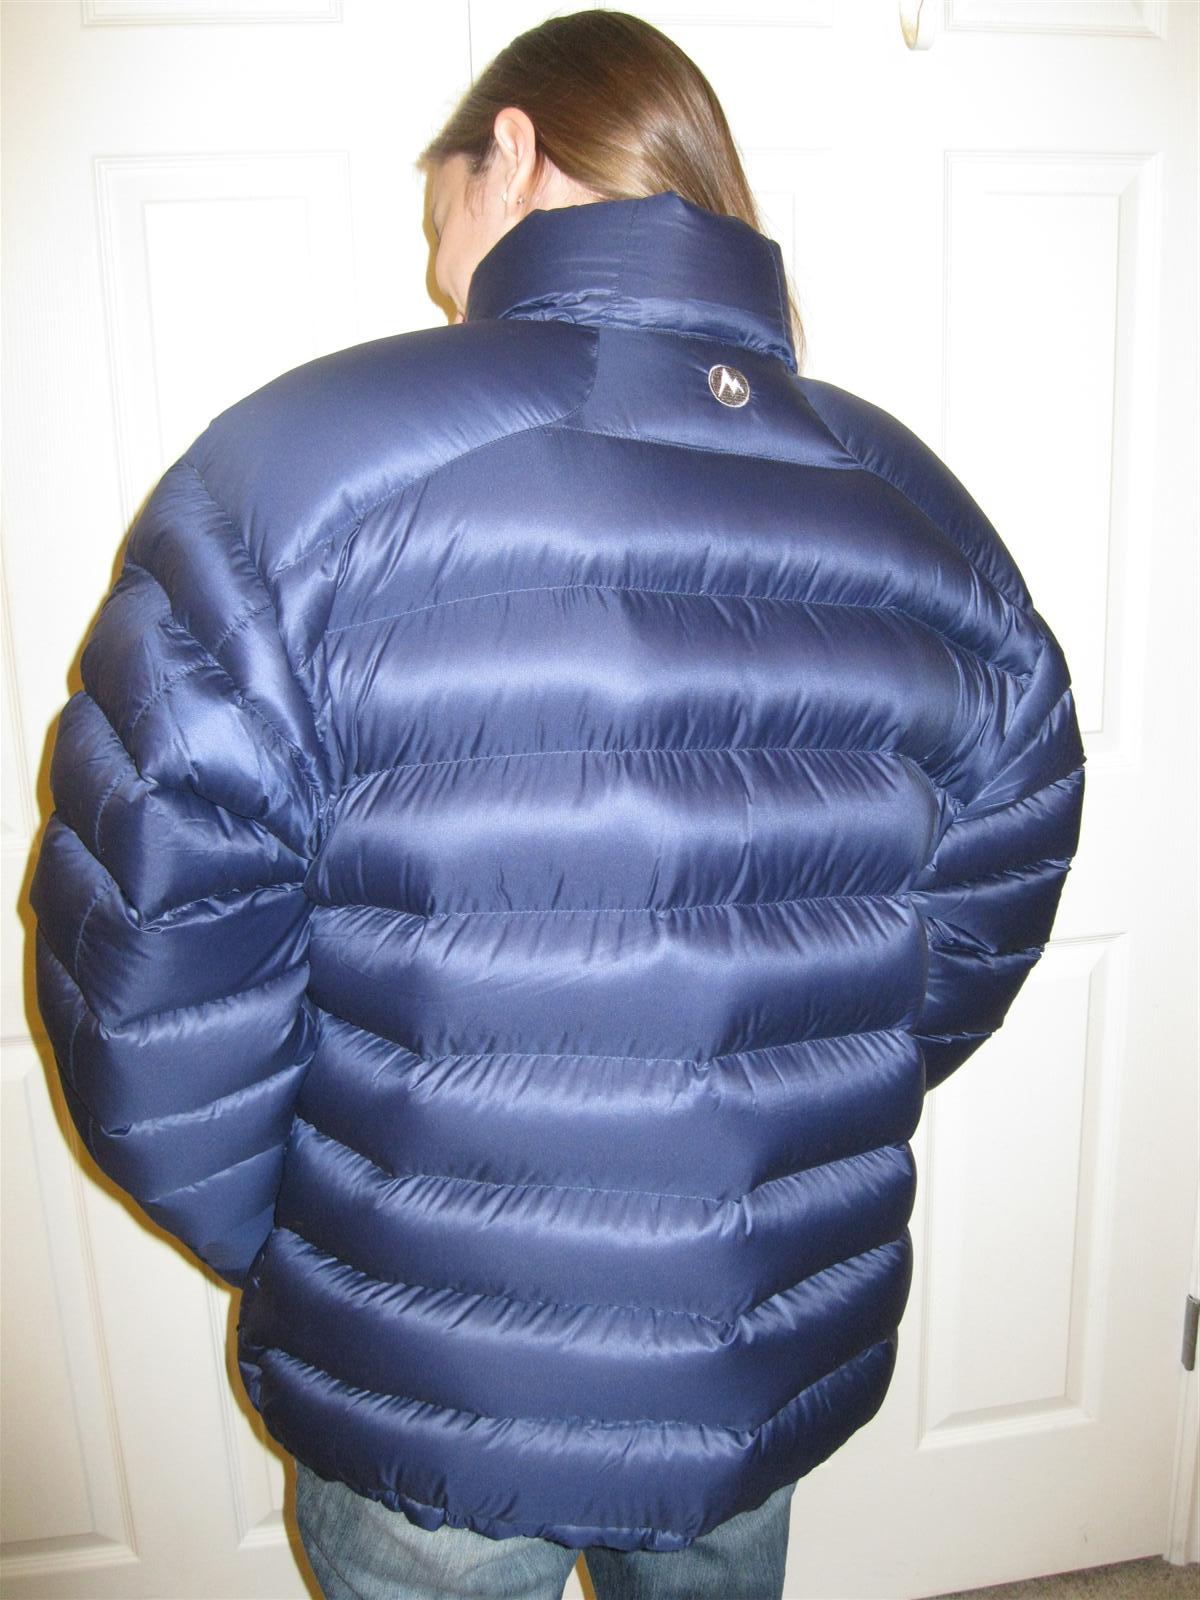 Marmot Zeus Overstuffed Jackets ba778d635